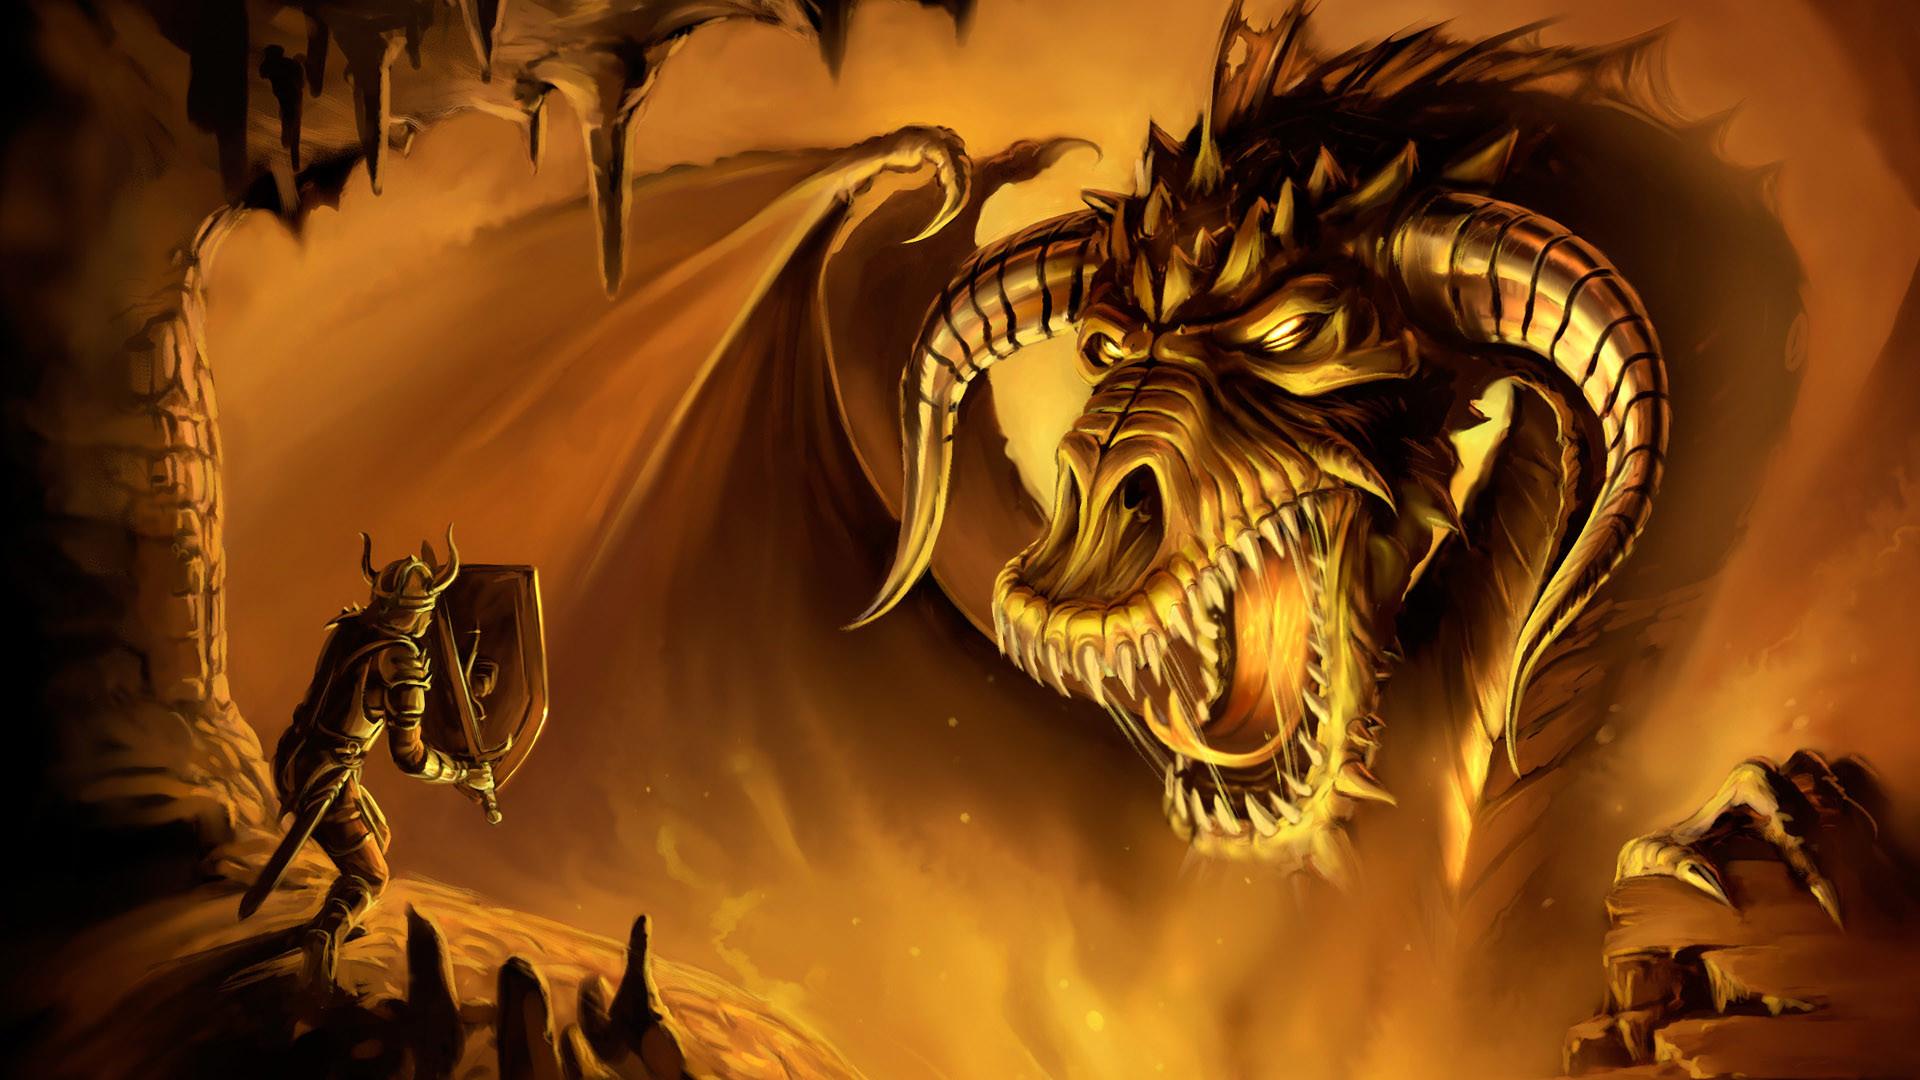 Fire Monster 2 Wallpaper